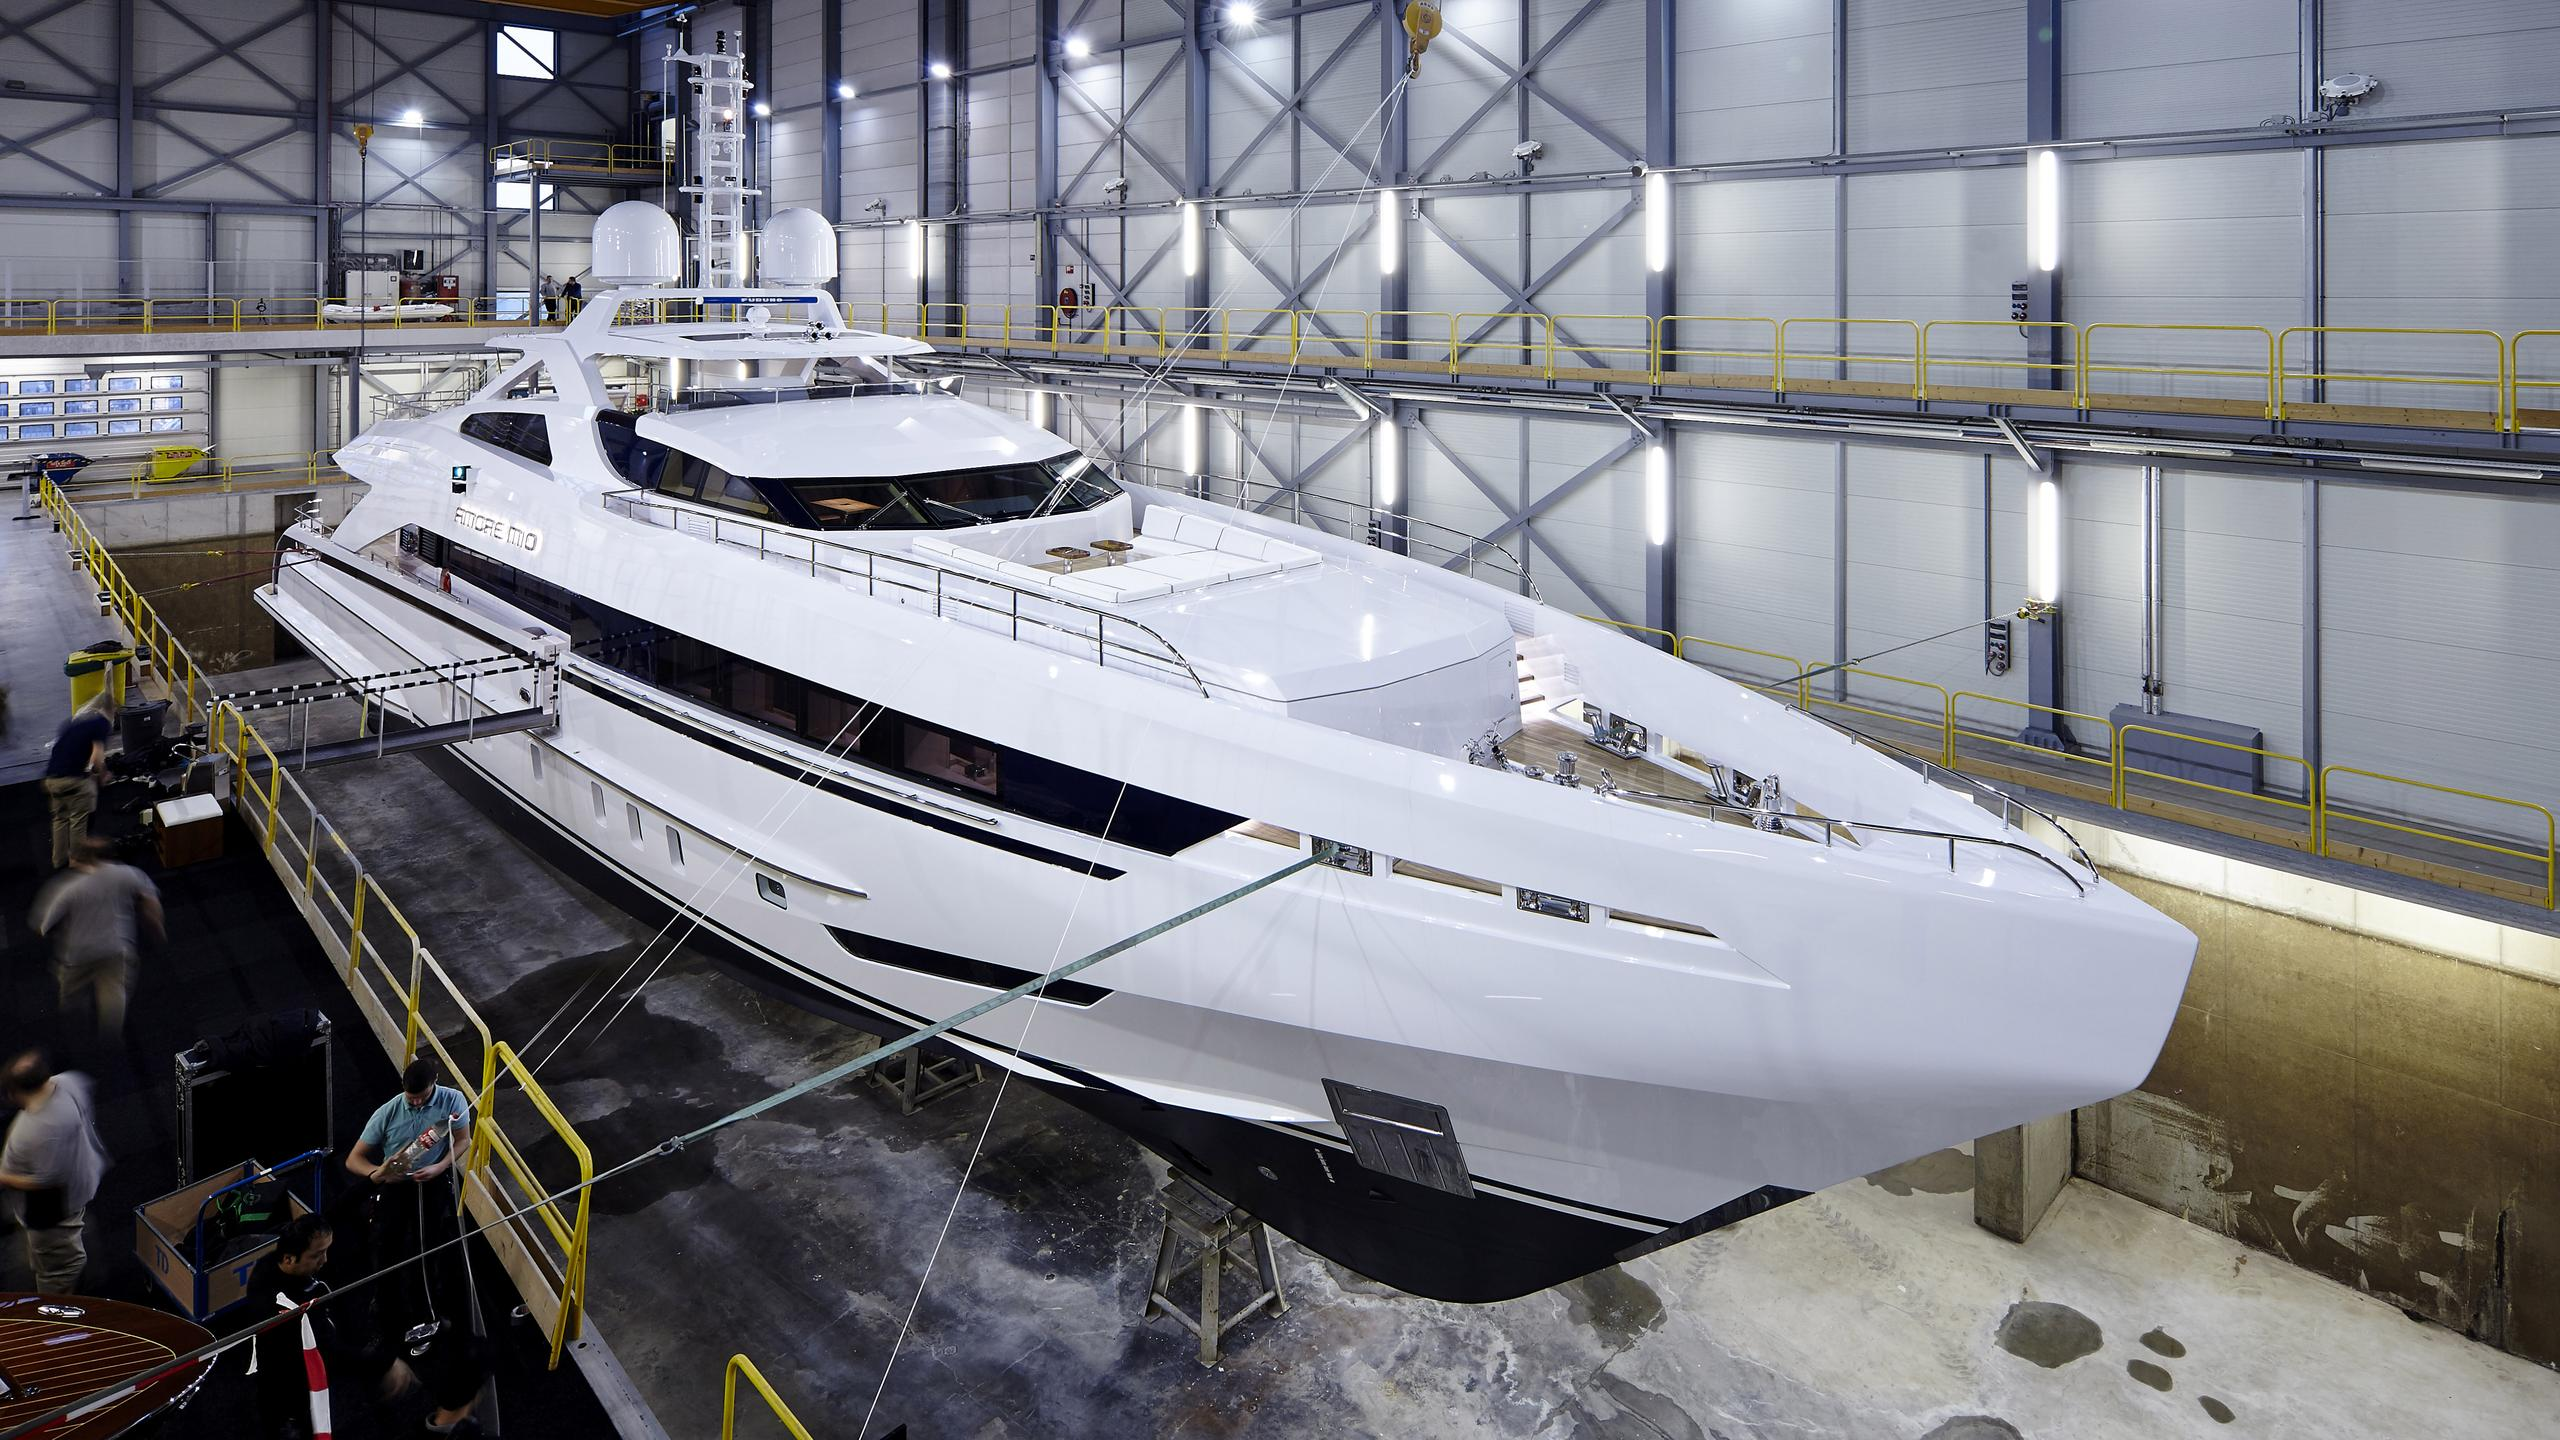 yacht-amore-mio